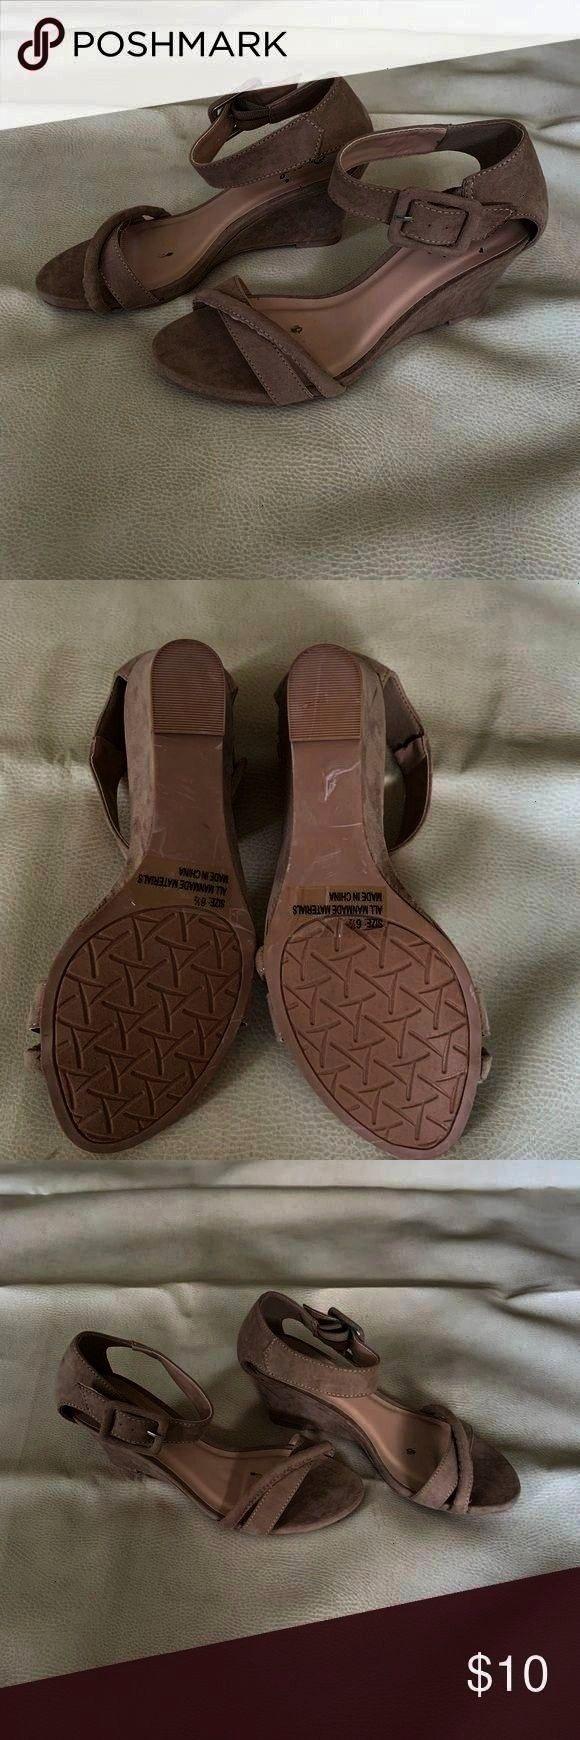 Low heel wedge sandals Shoes Wedges  My Posh Picks  Tan suede wedge Low heel wedge sandals Shoes Wedges  My Posh Picks  Tan suede wedge Low heel wedge sandals Shoes Wedge...